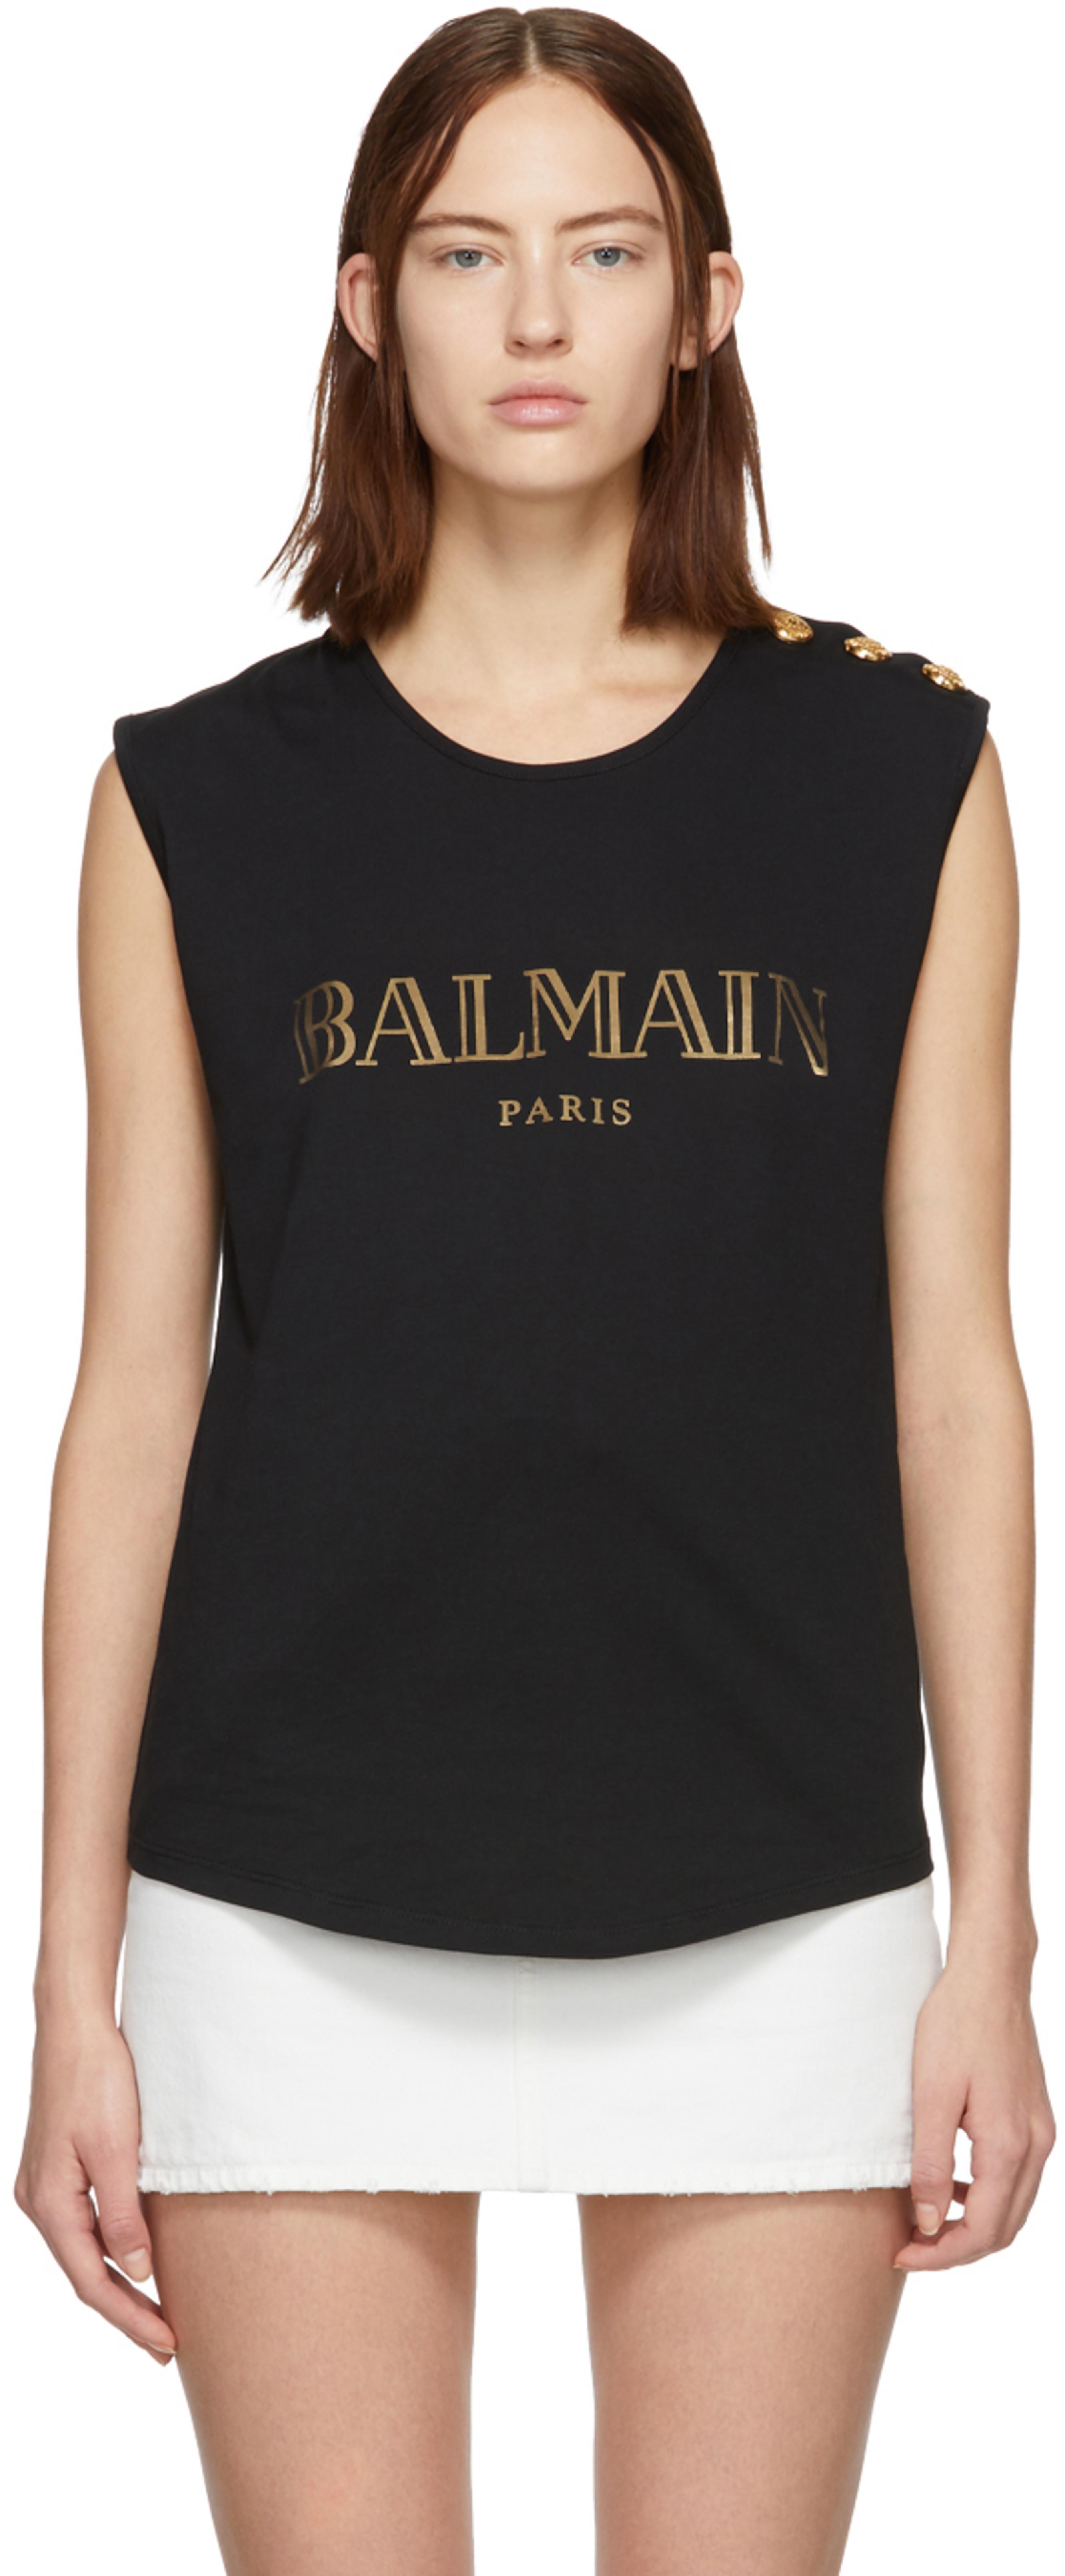 d5d2aedd Balmain for Women SS19 Collection | SSENSE Canada